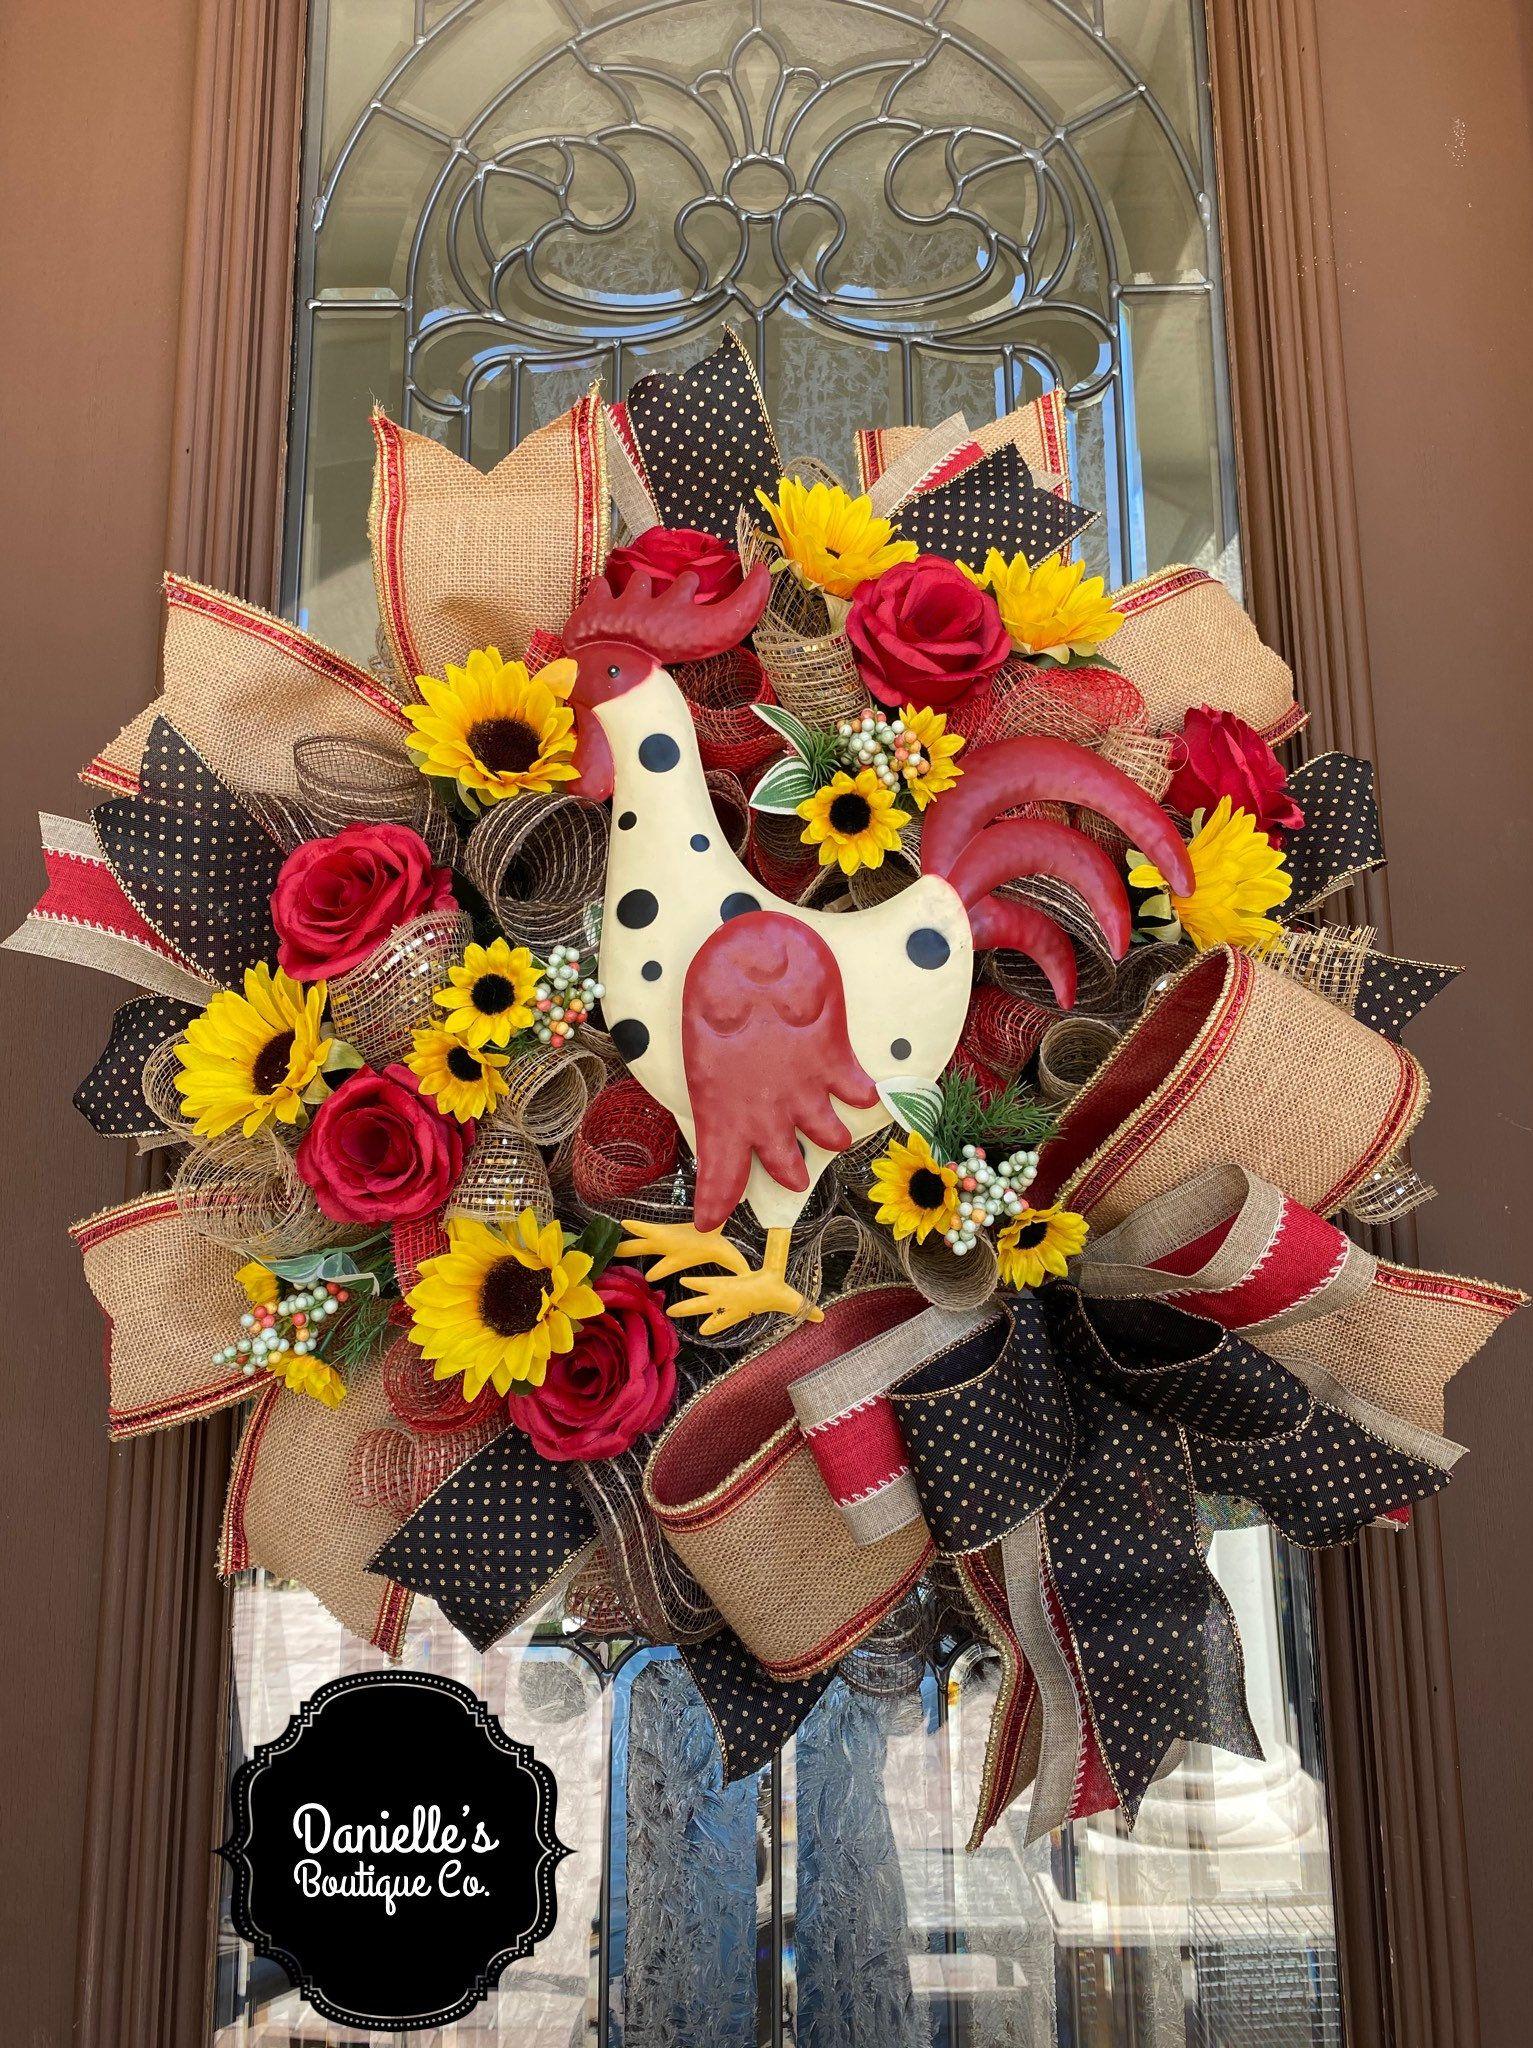 Photo of Farmhouse Wreath, Rooster Wreath, Farmhouse Decor, Rooster Decor, Sunflower Wreath, Rose Wreath, Burlap Wreath, Country Wreath, Barn Wreath